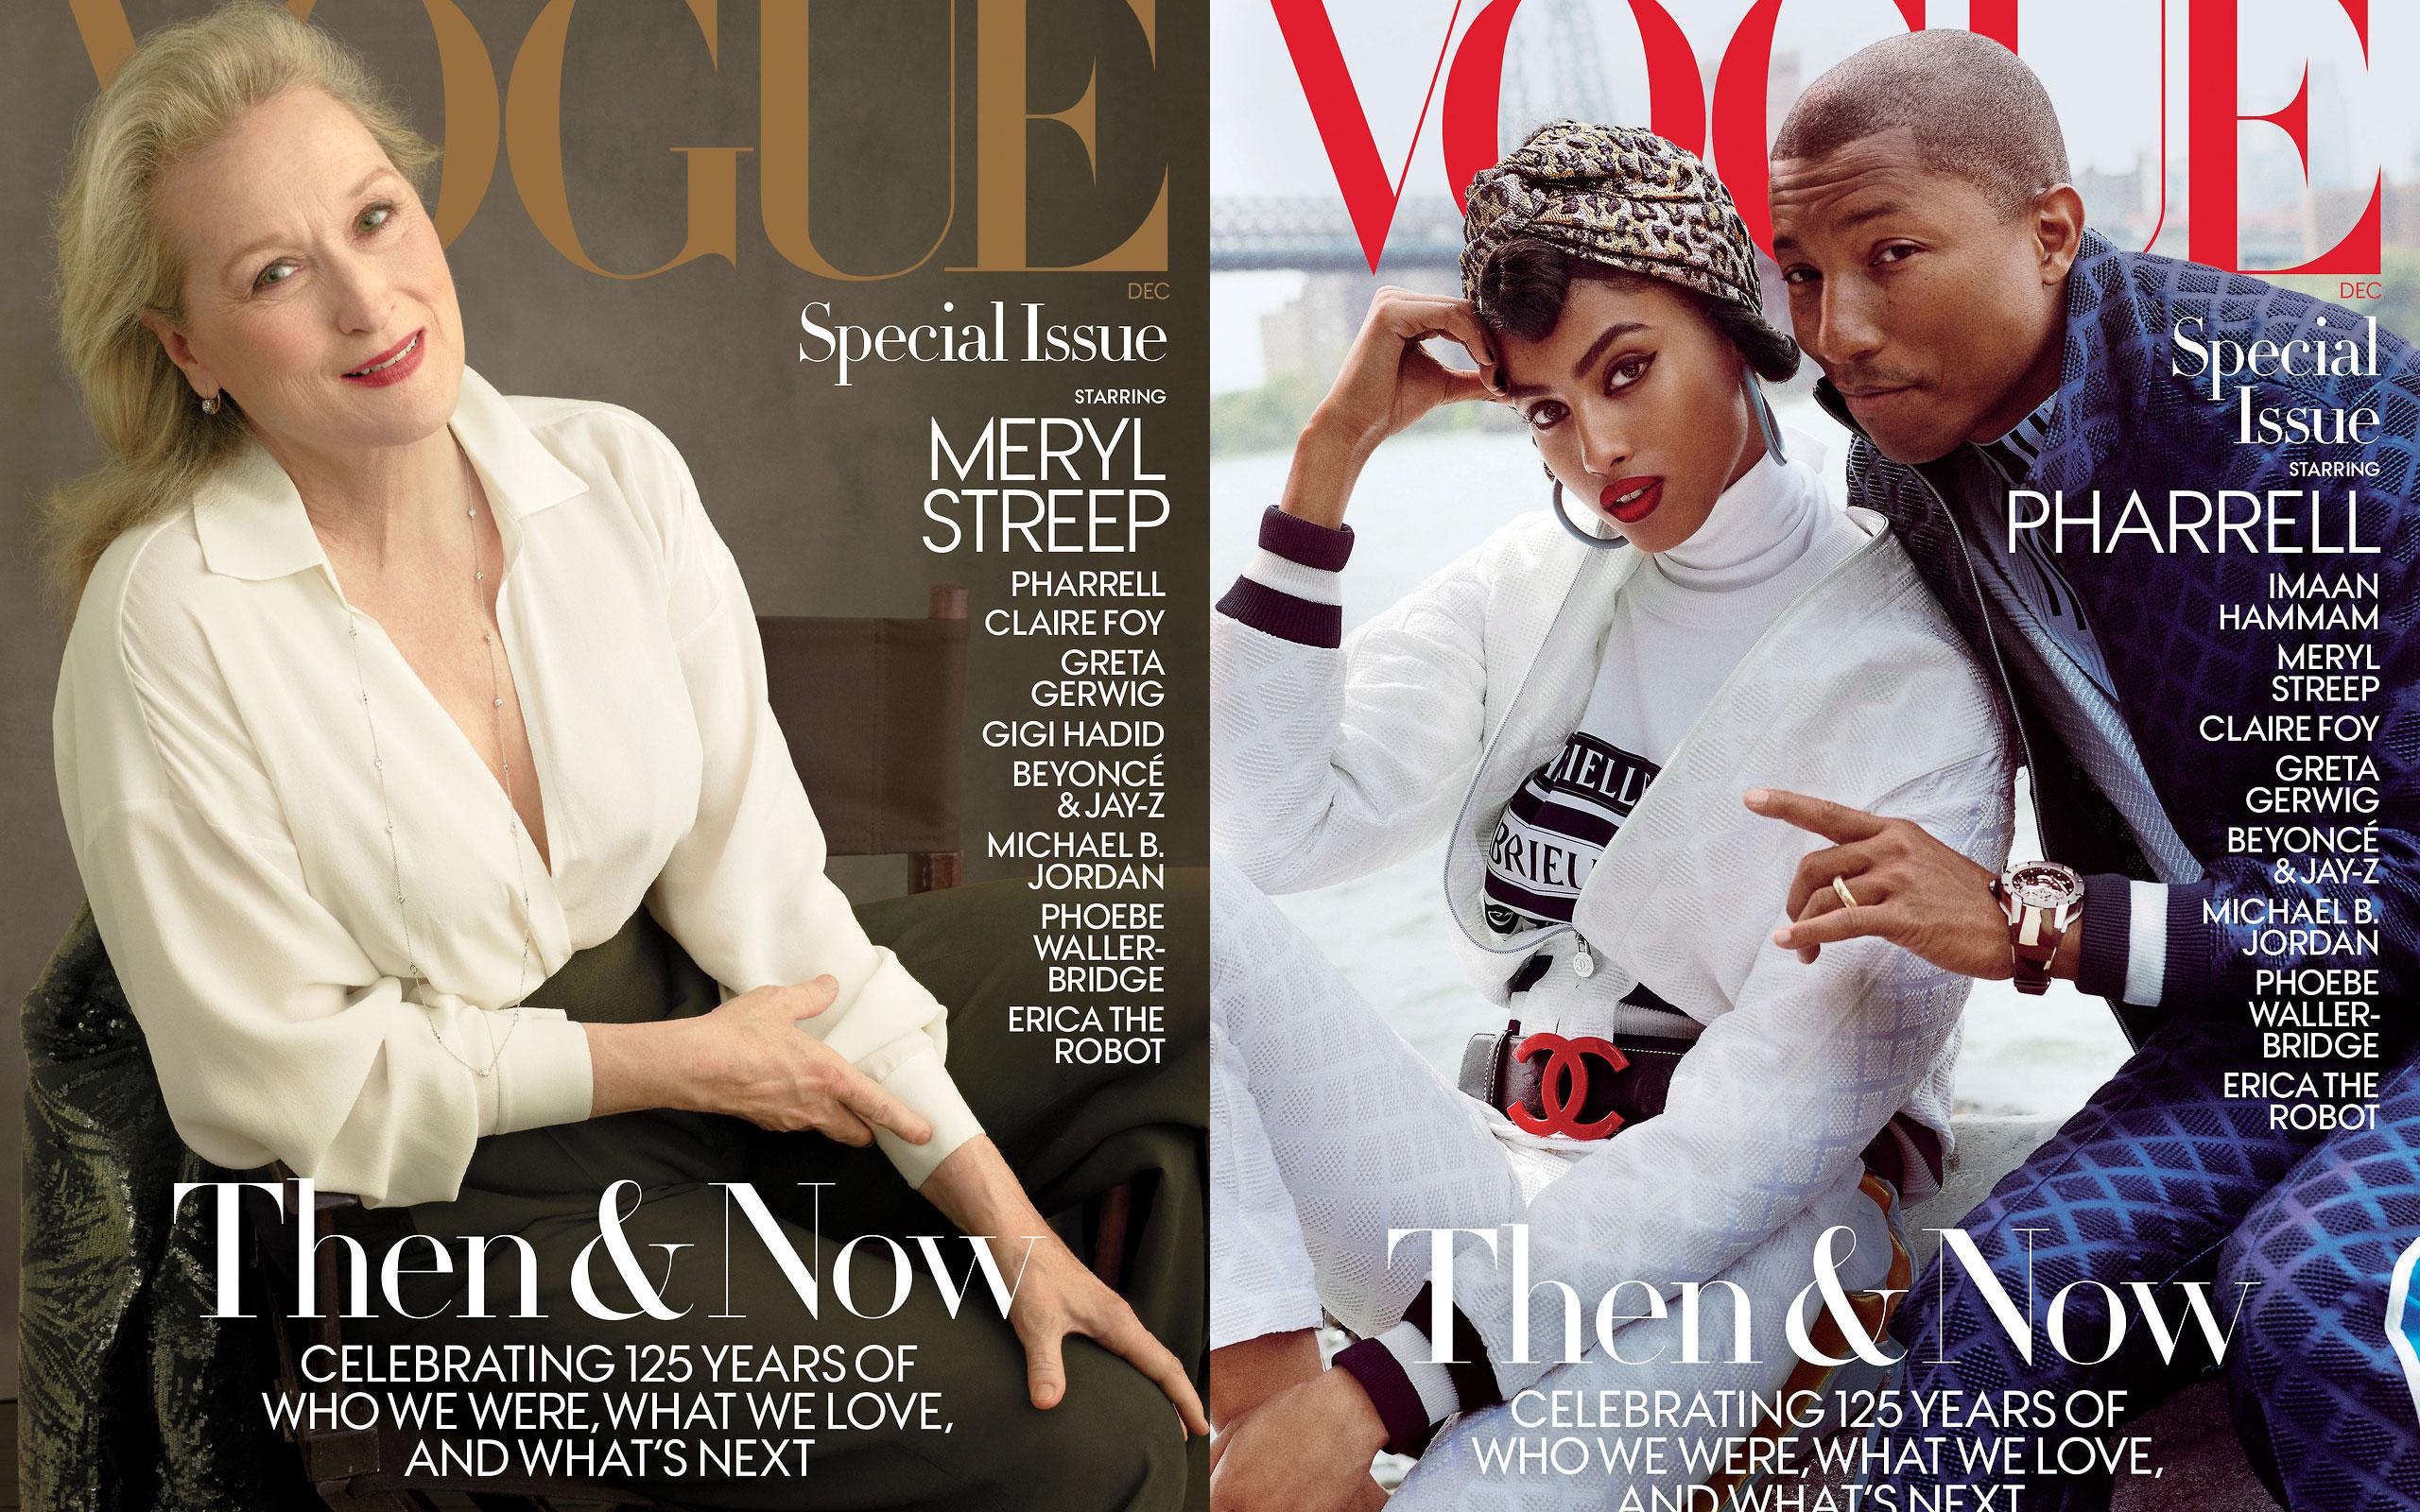 Meryl Streep Talks Anna Wintour For Vogue